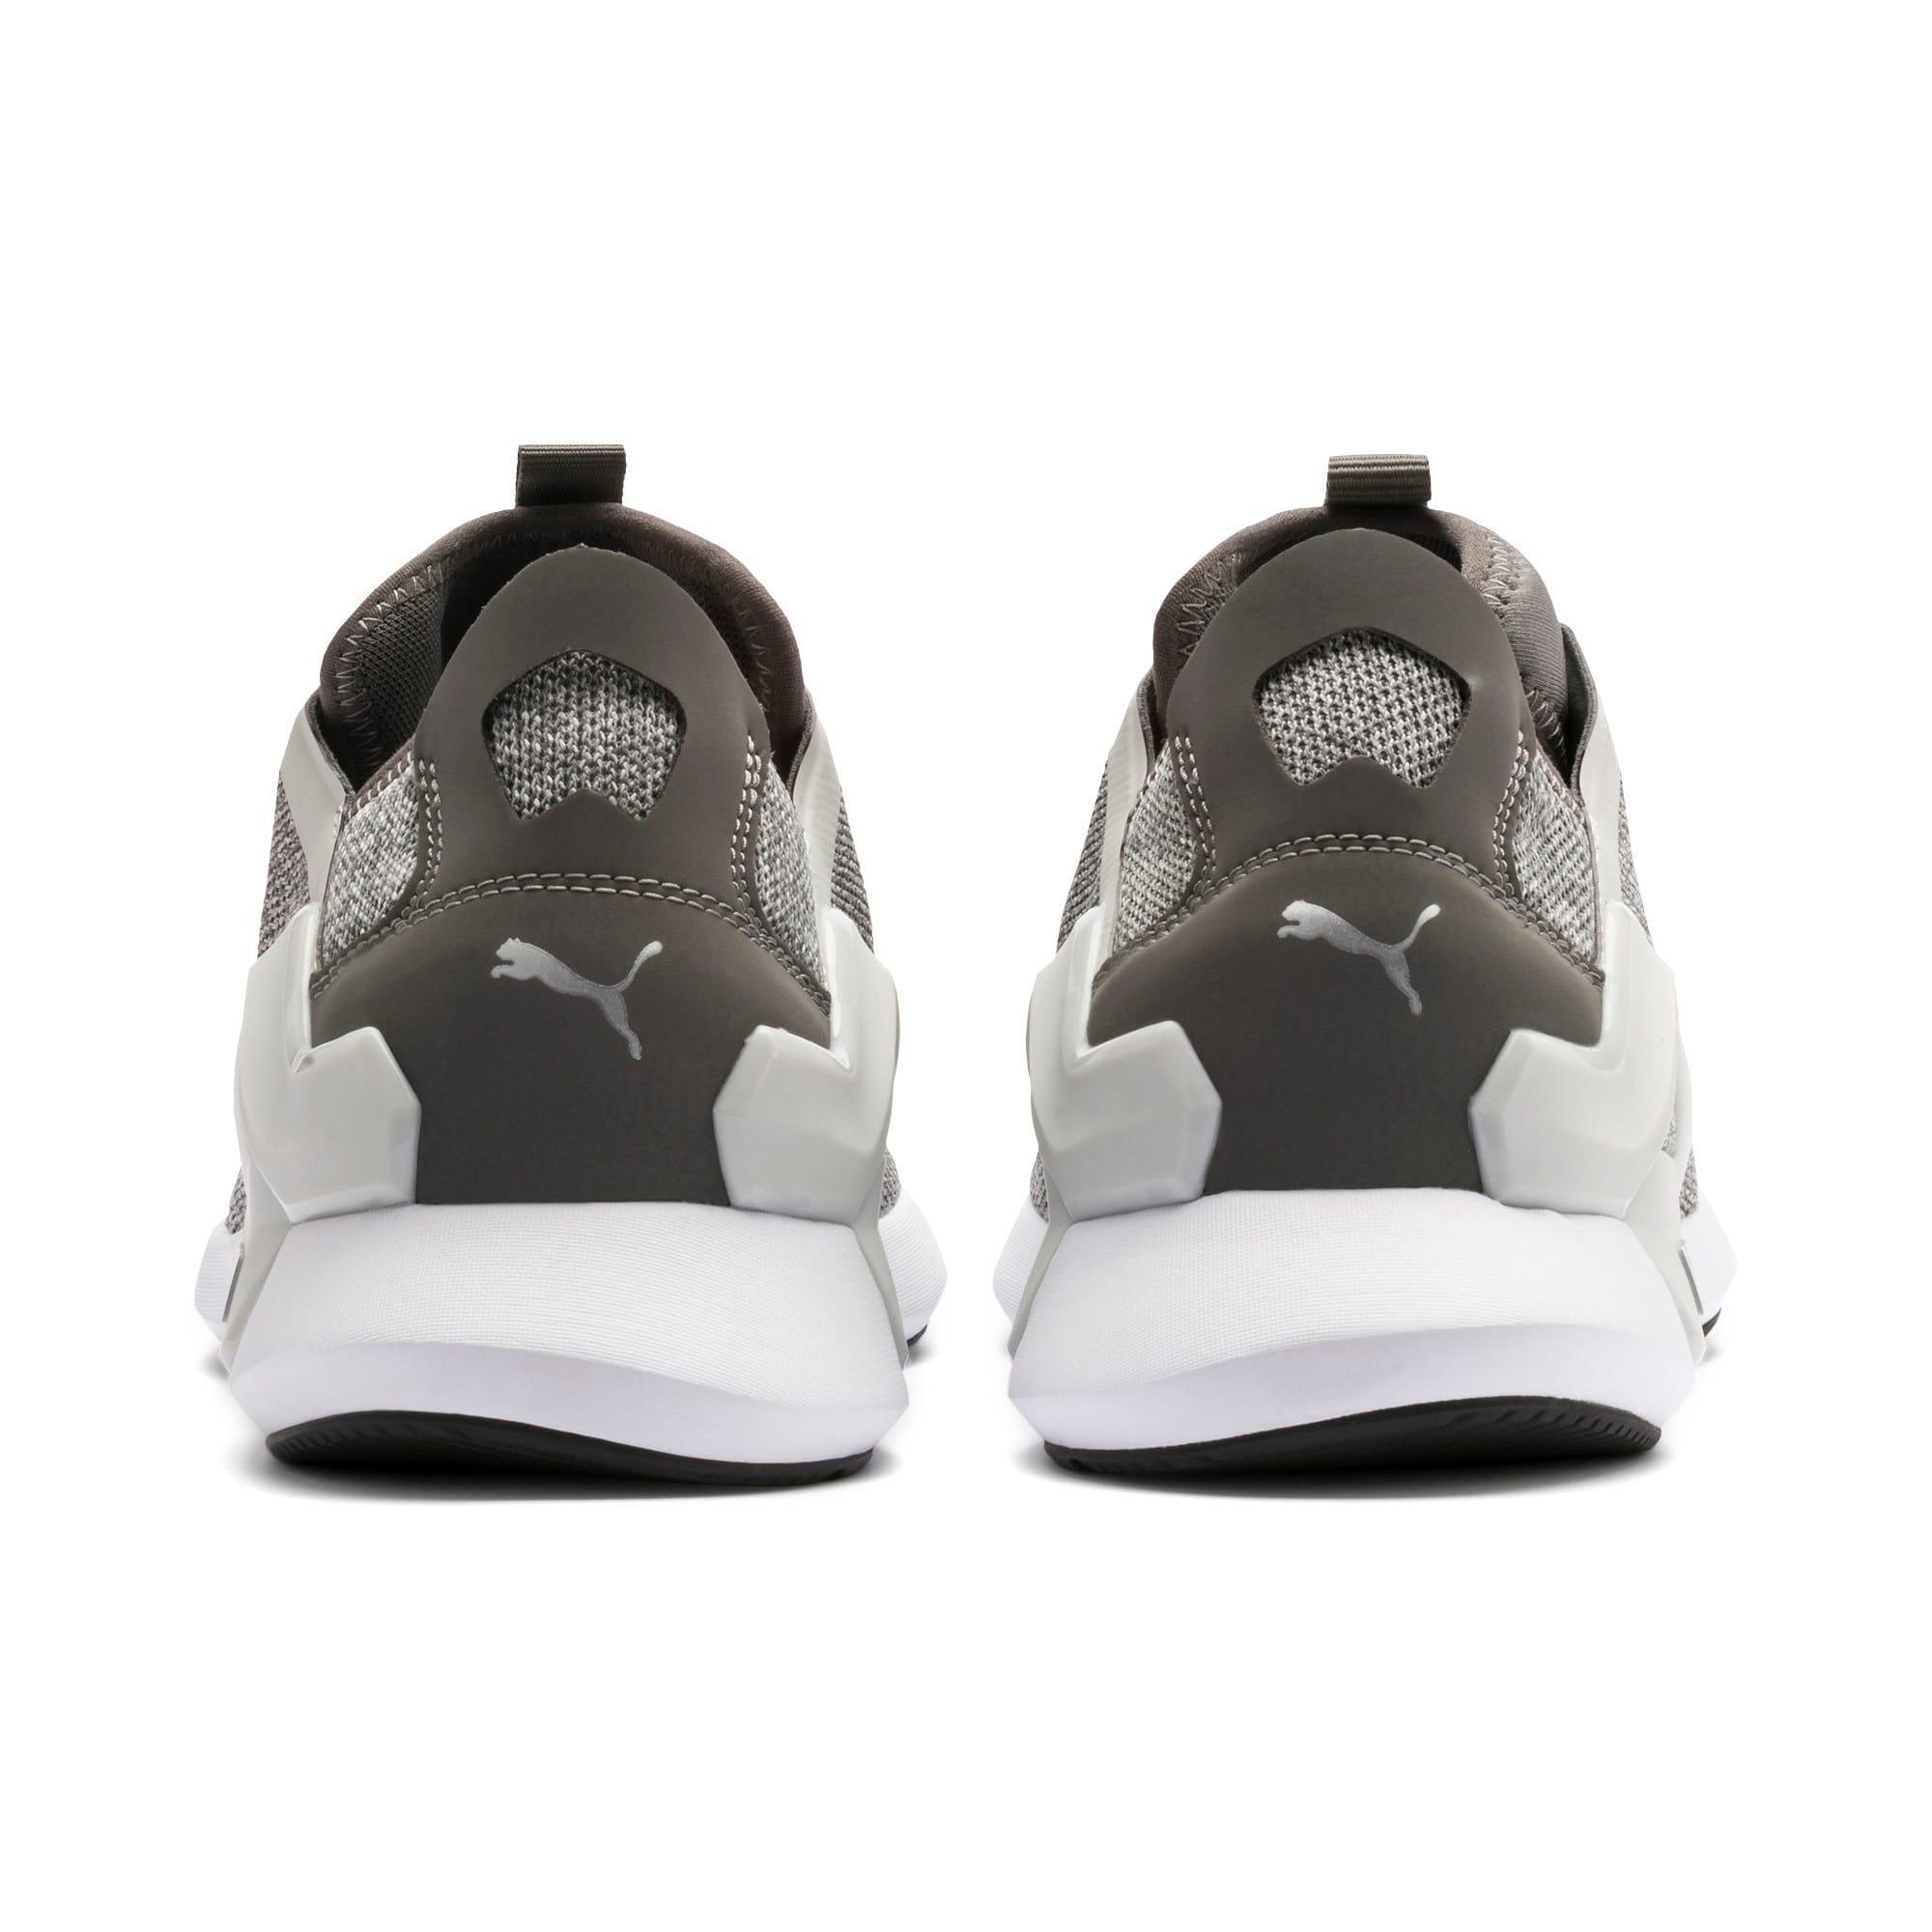 Thumbnail 4 of Rogue X Knit Herren Sneaker, CASTLEROCK-Glacier Gray, medium